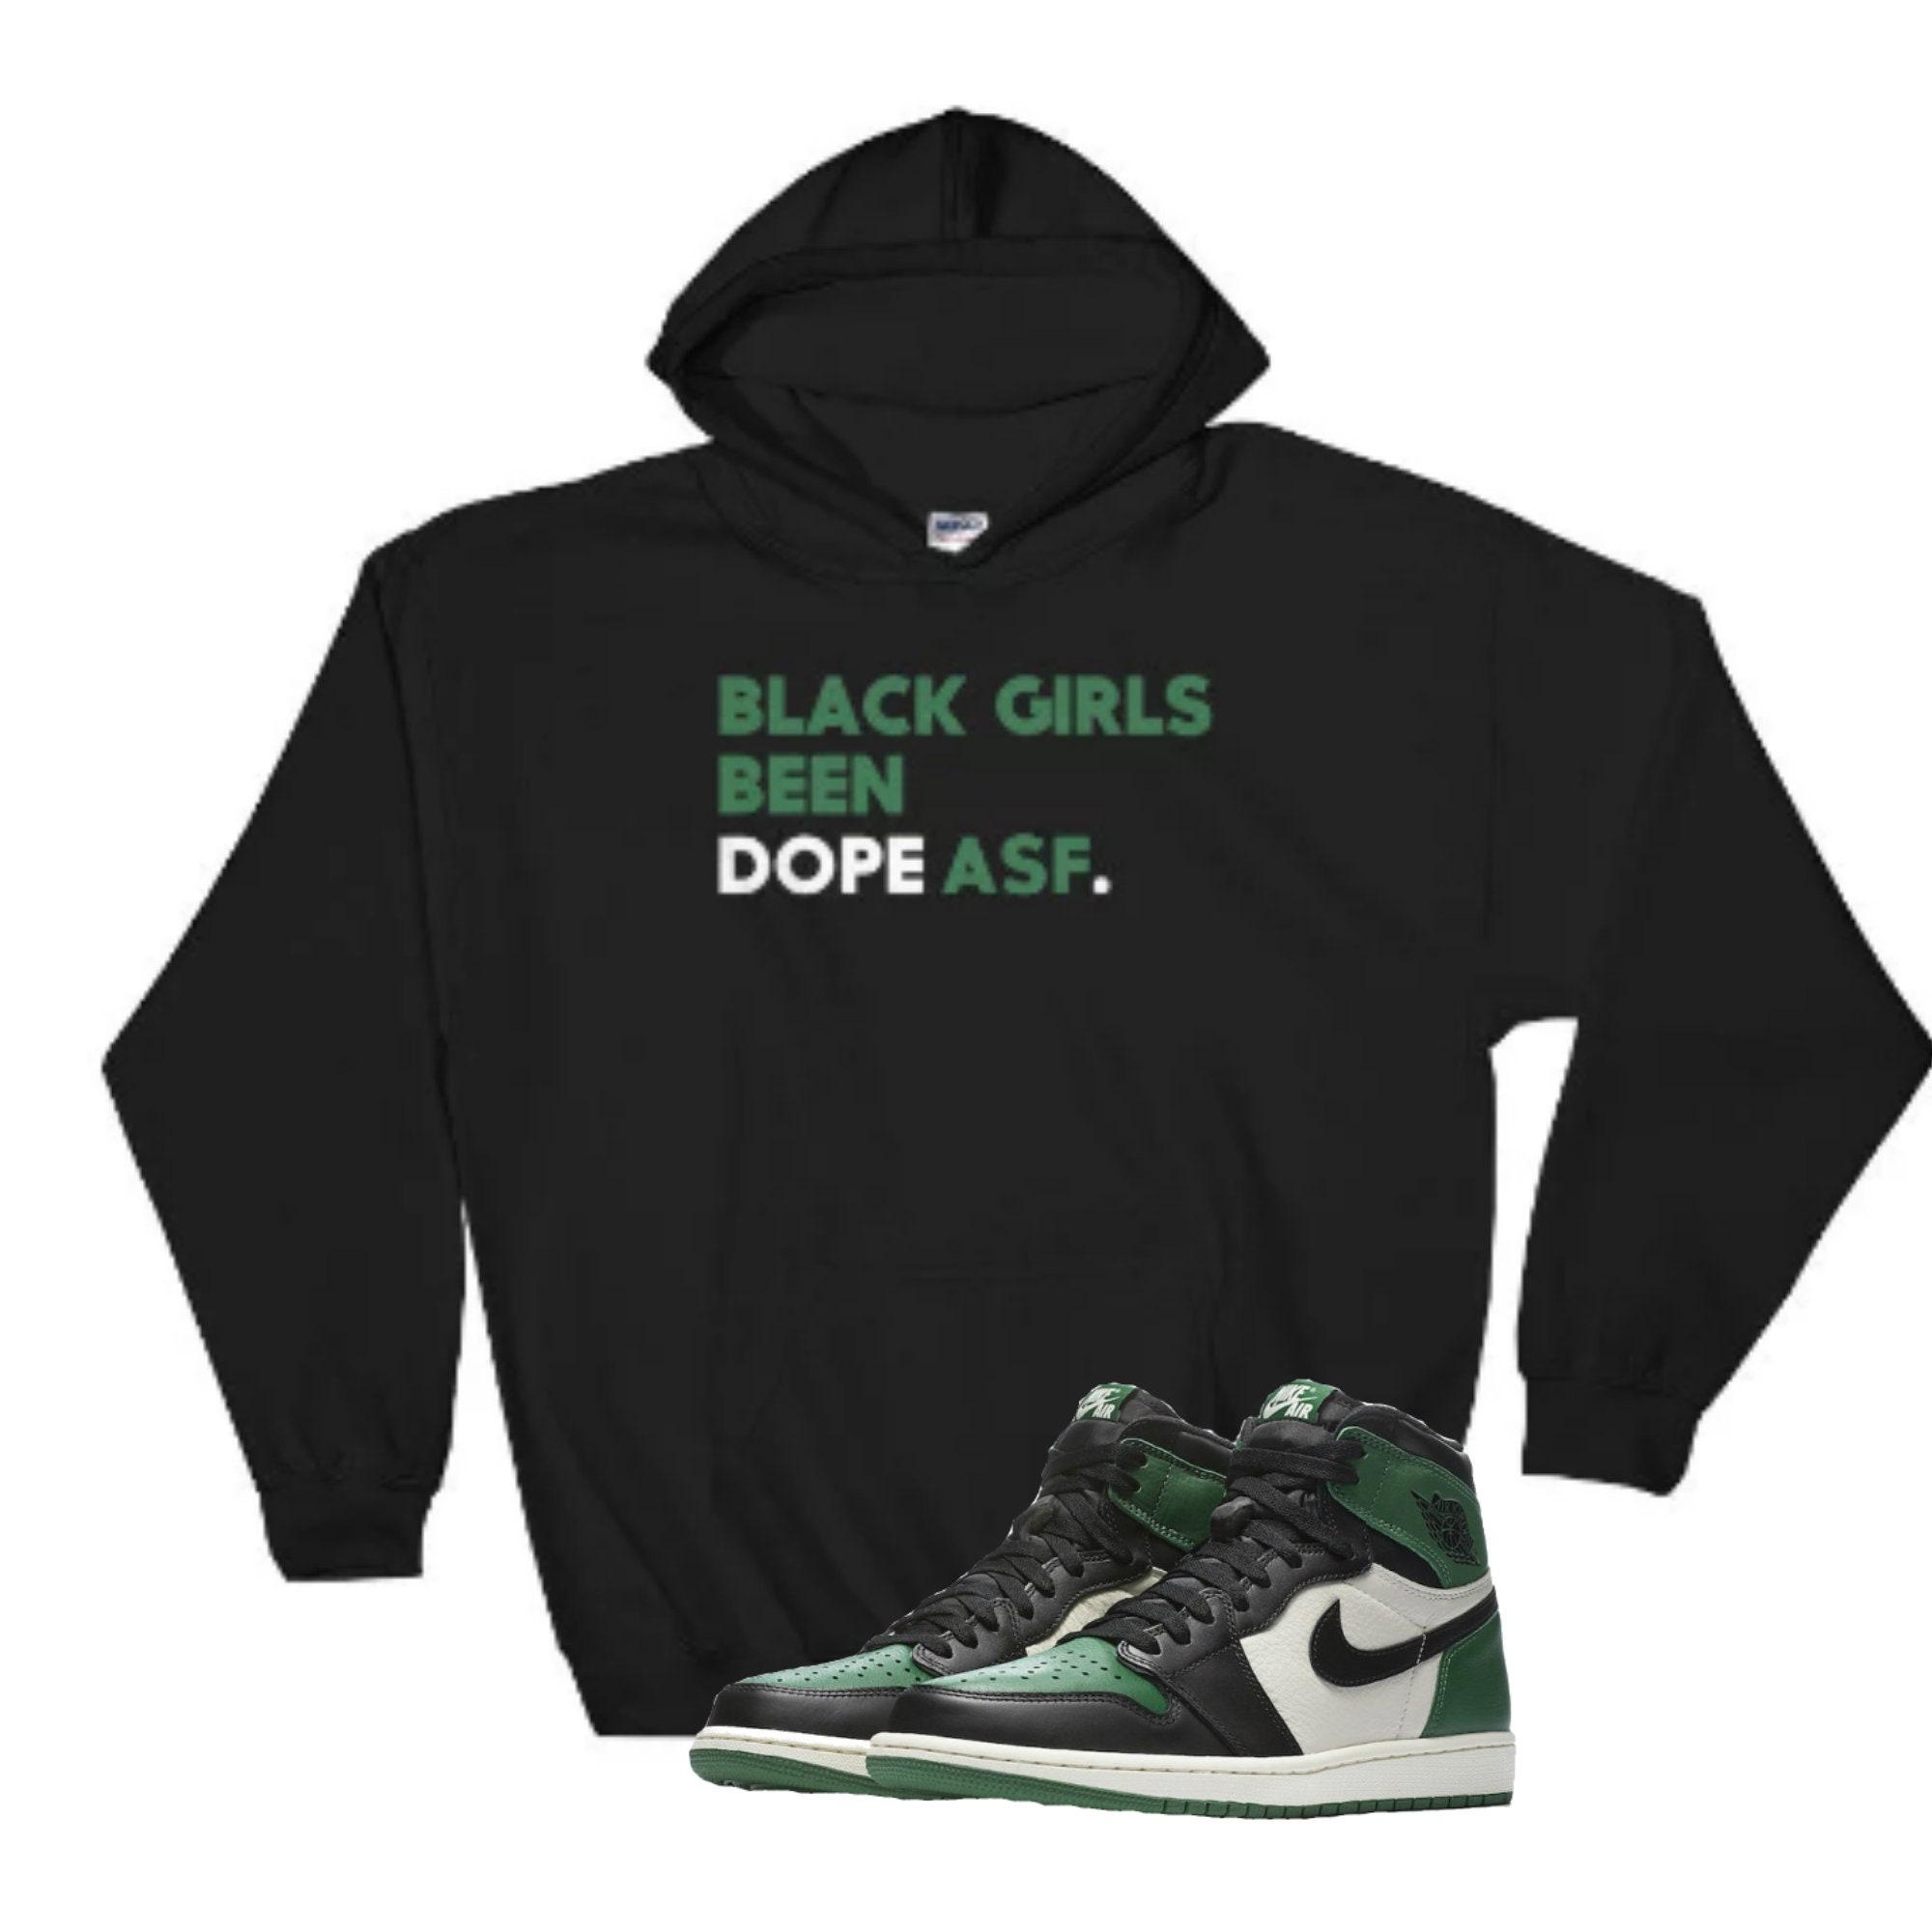 Black Girls Been Dope ASF Women s Hoodie Nike Air Jordan  c2d7242d70